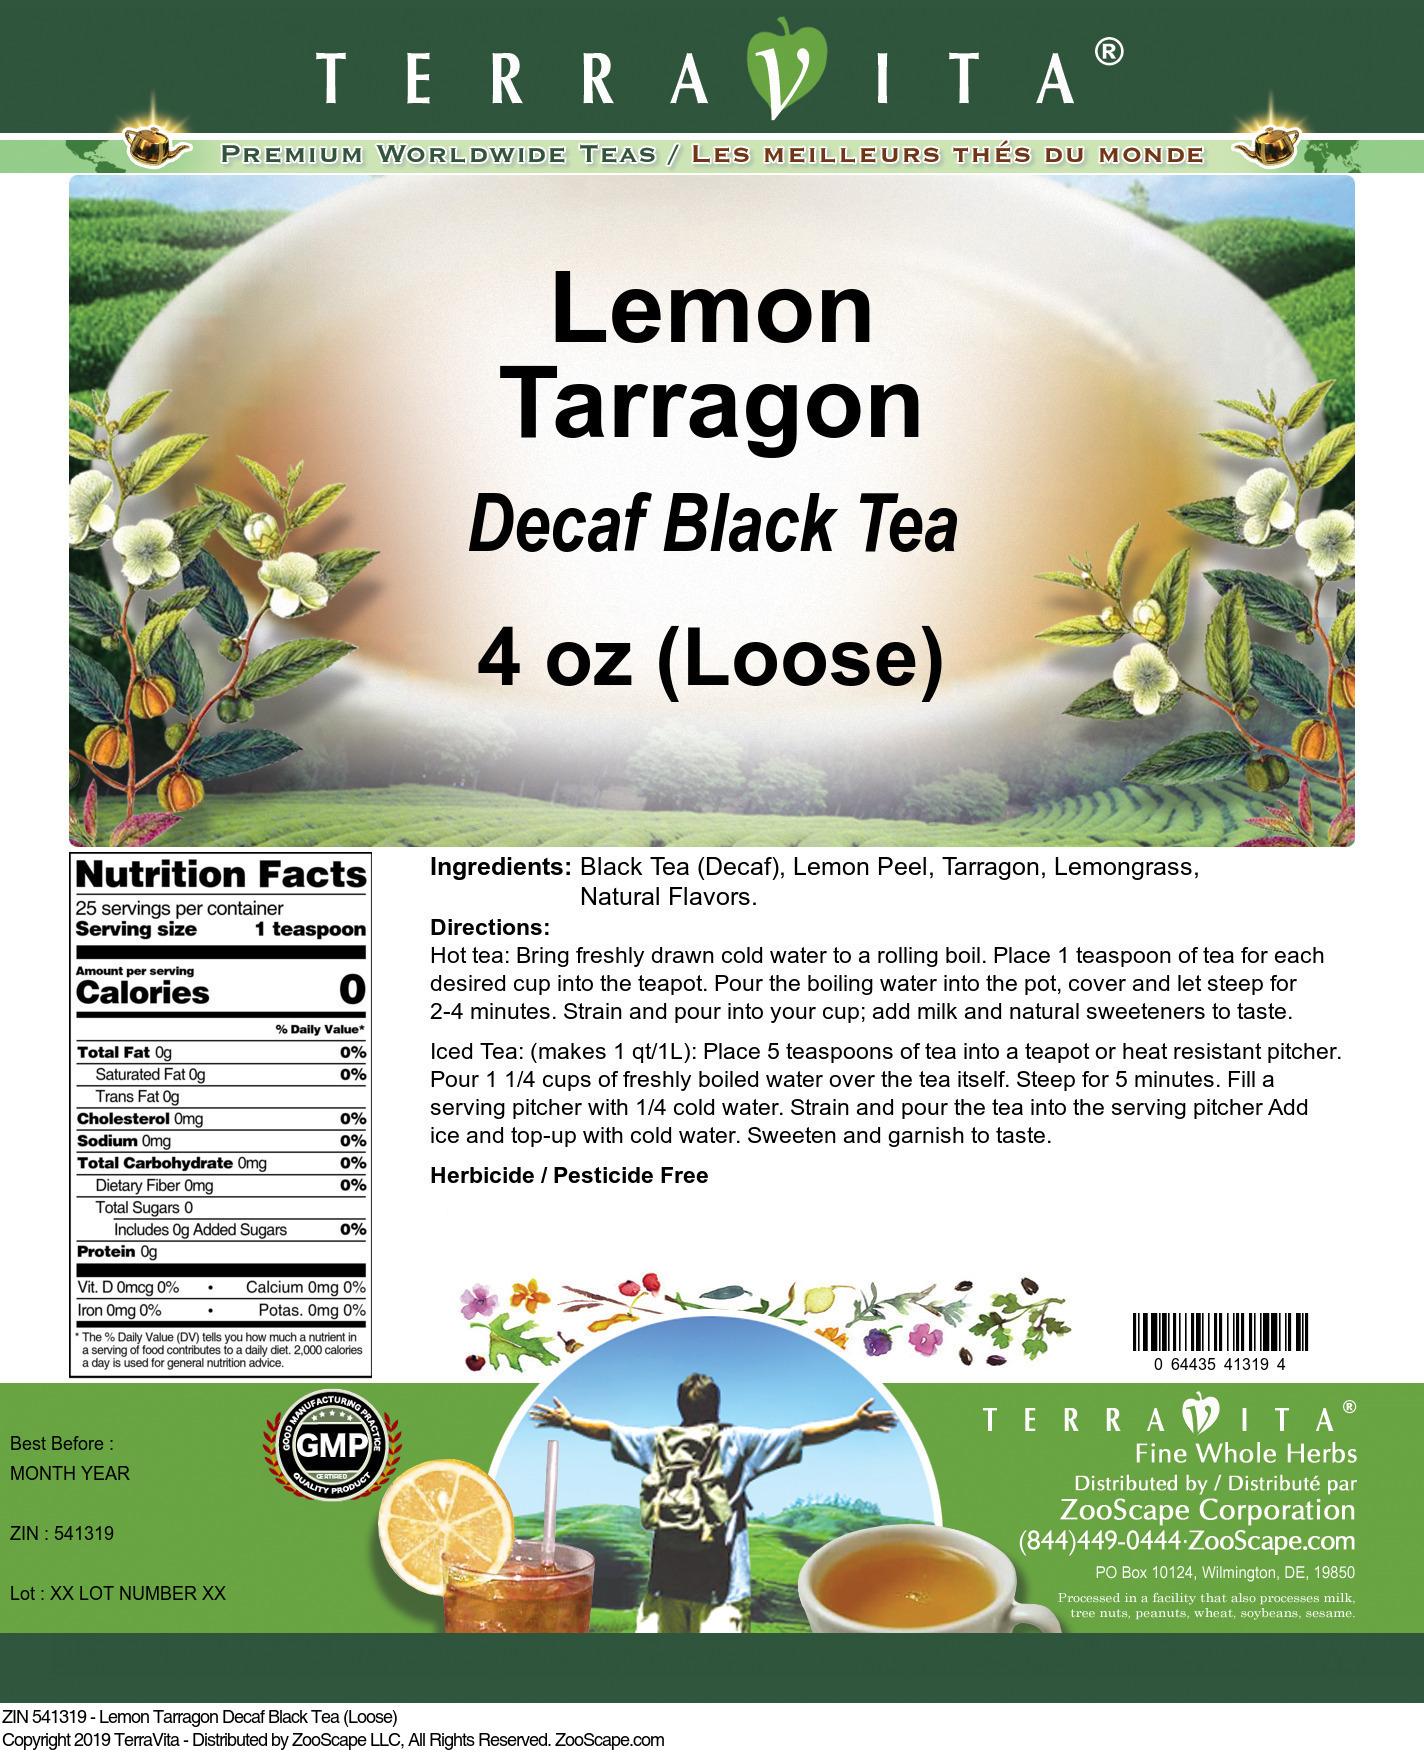 Lemon Tarragon Decaf Black Tea (Loose)